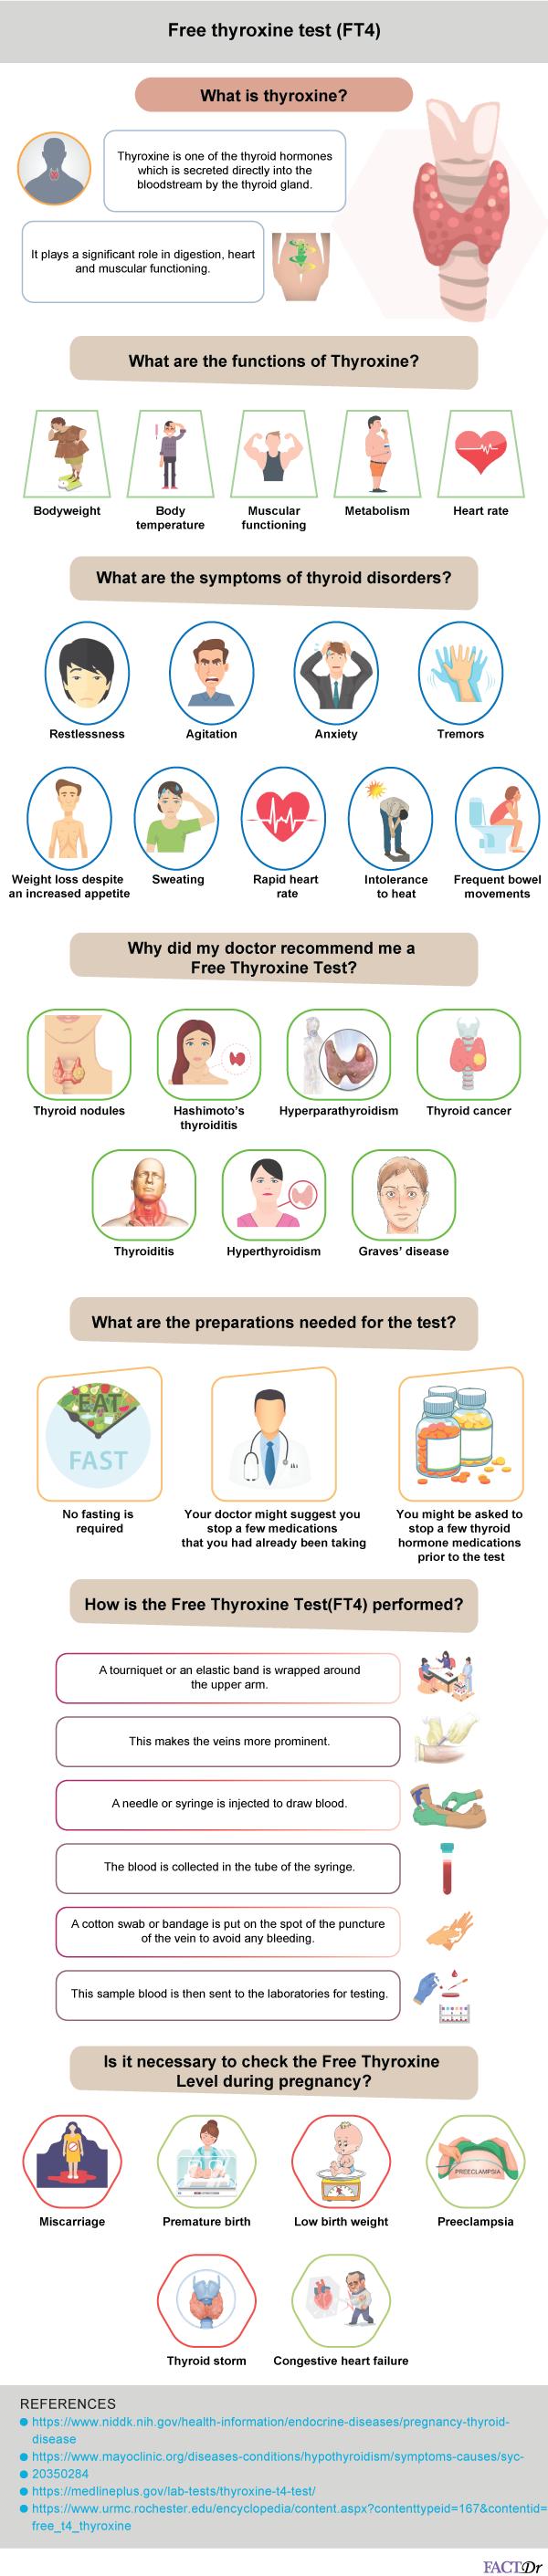 free thyroxine test